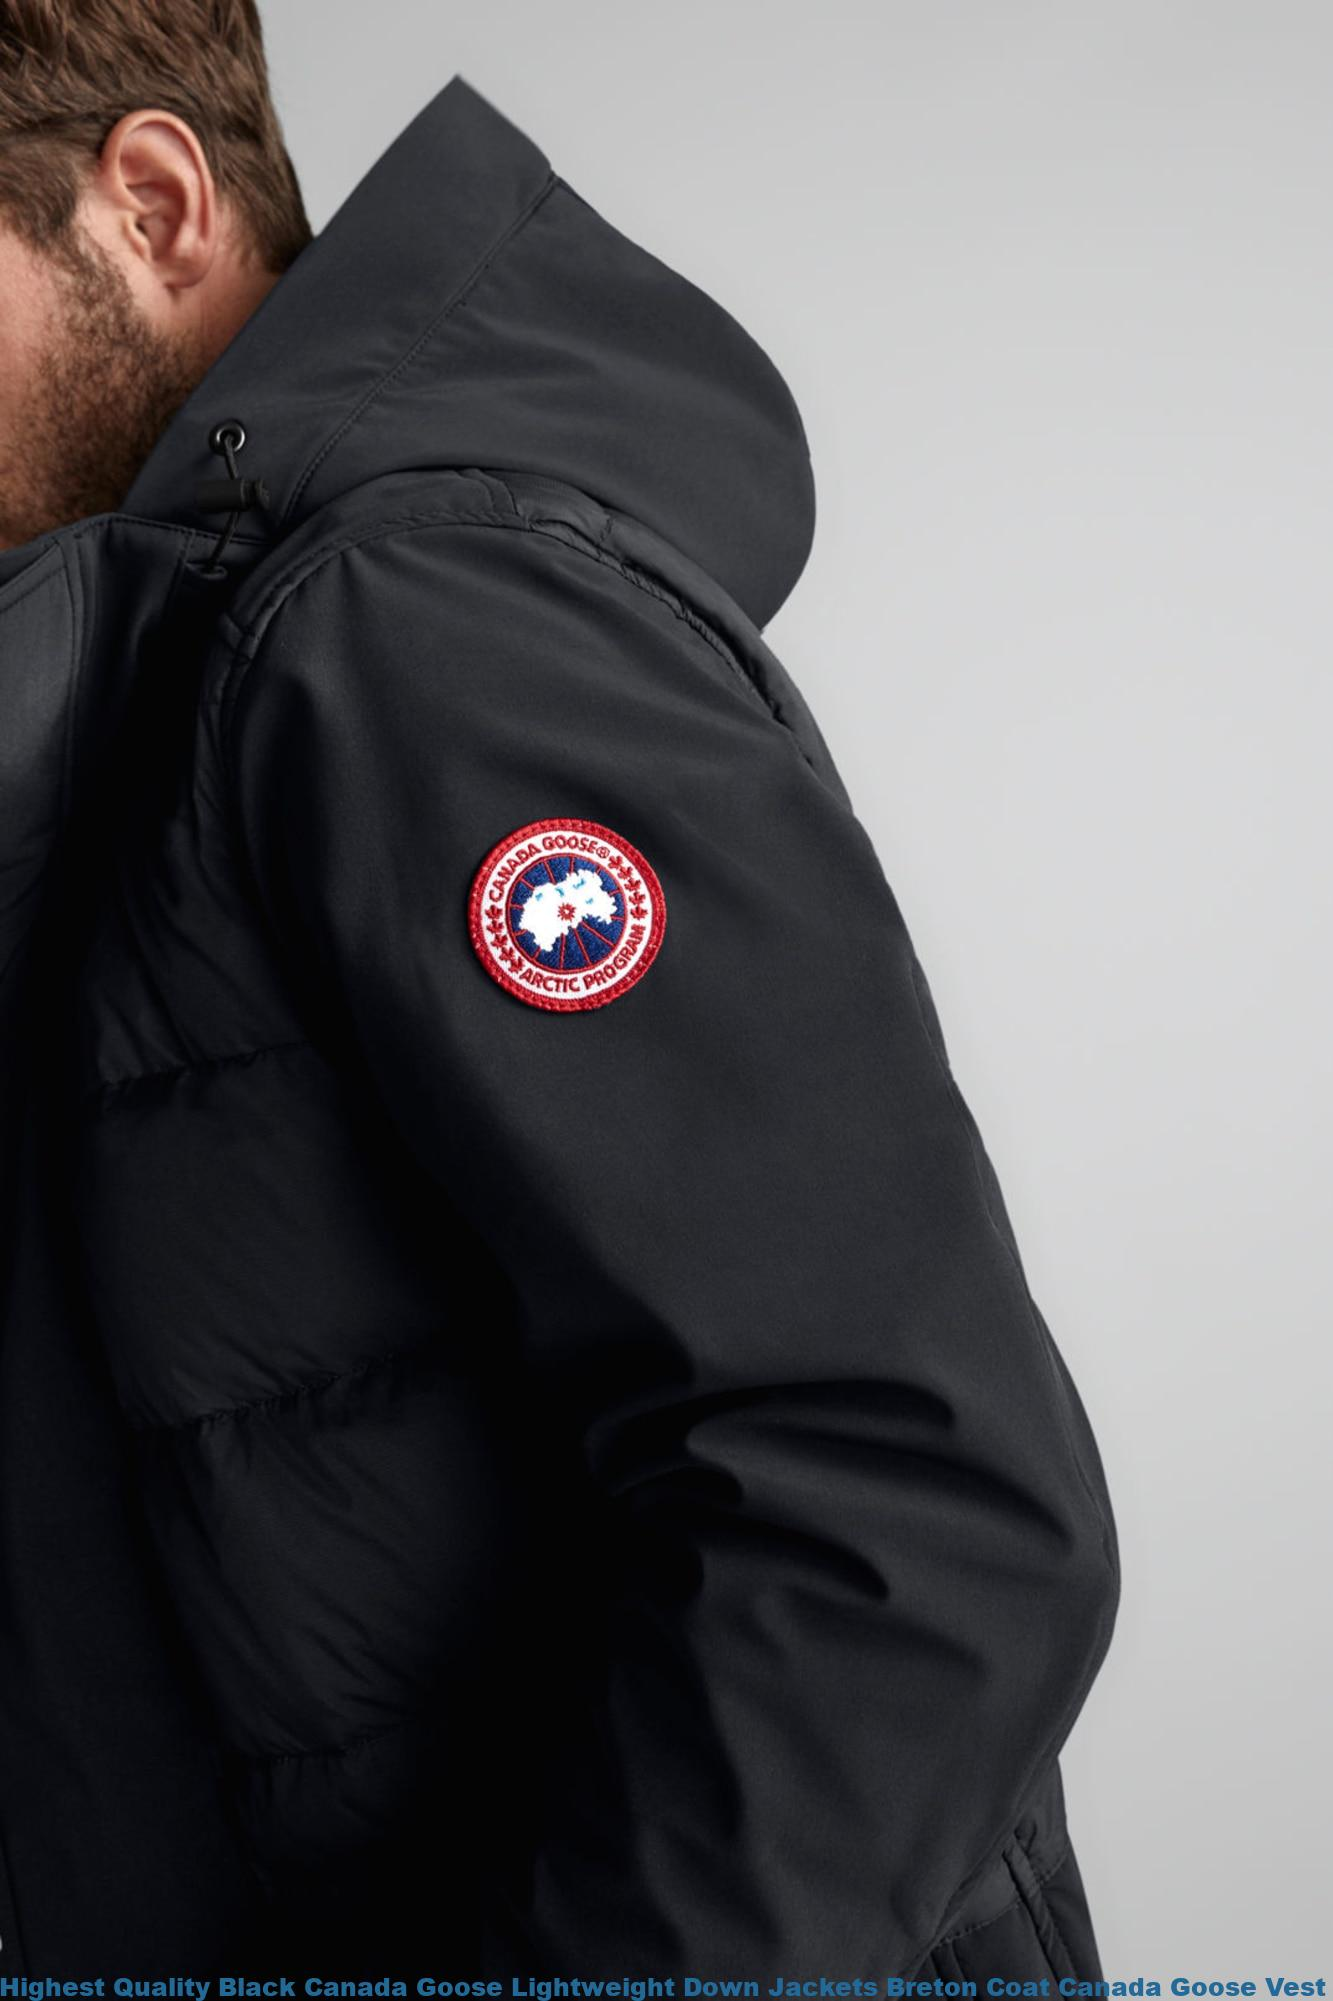 Canada Goose Down Jackets – 80% off Canada Goose Jacket